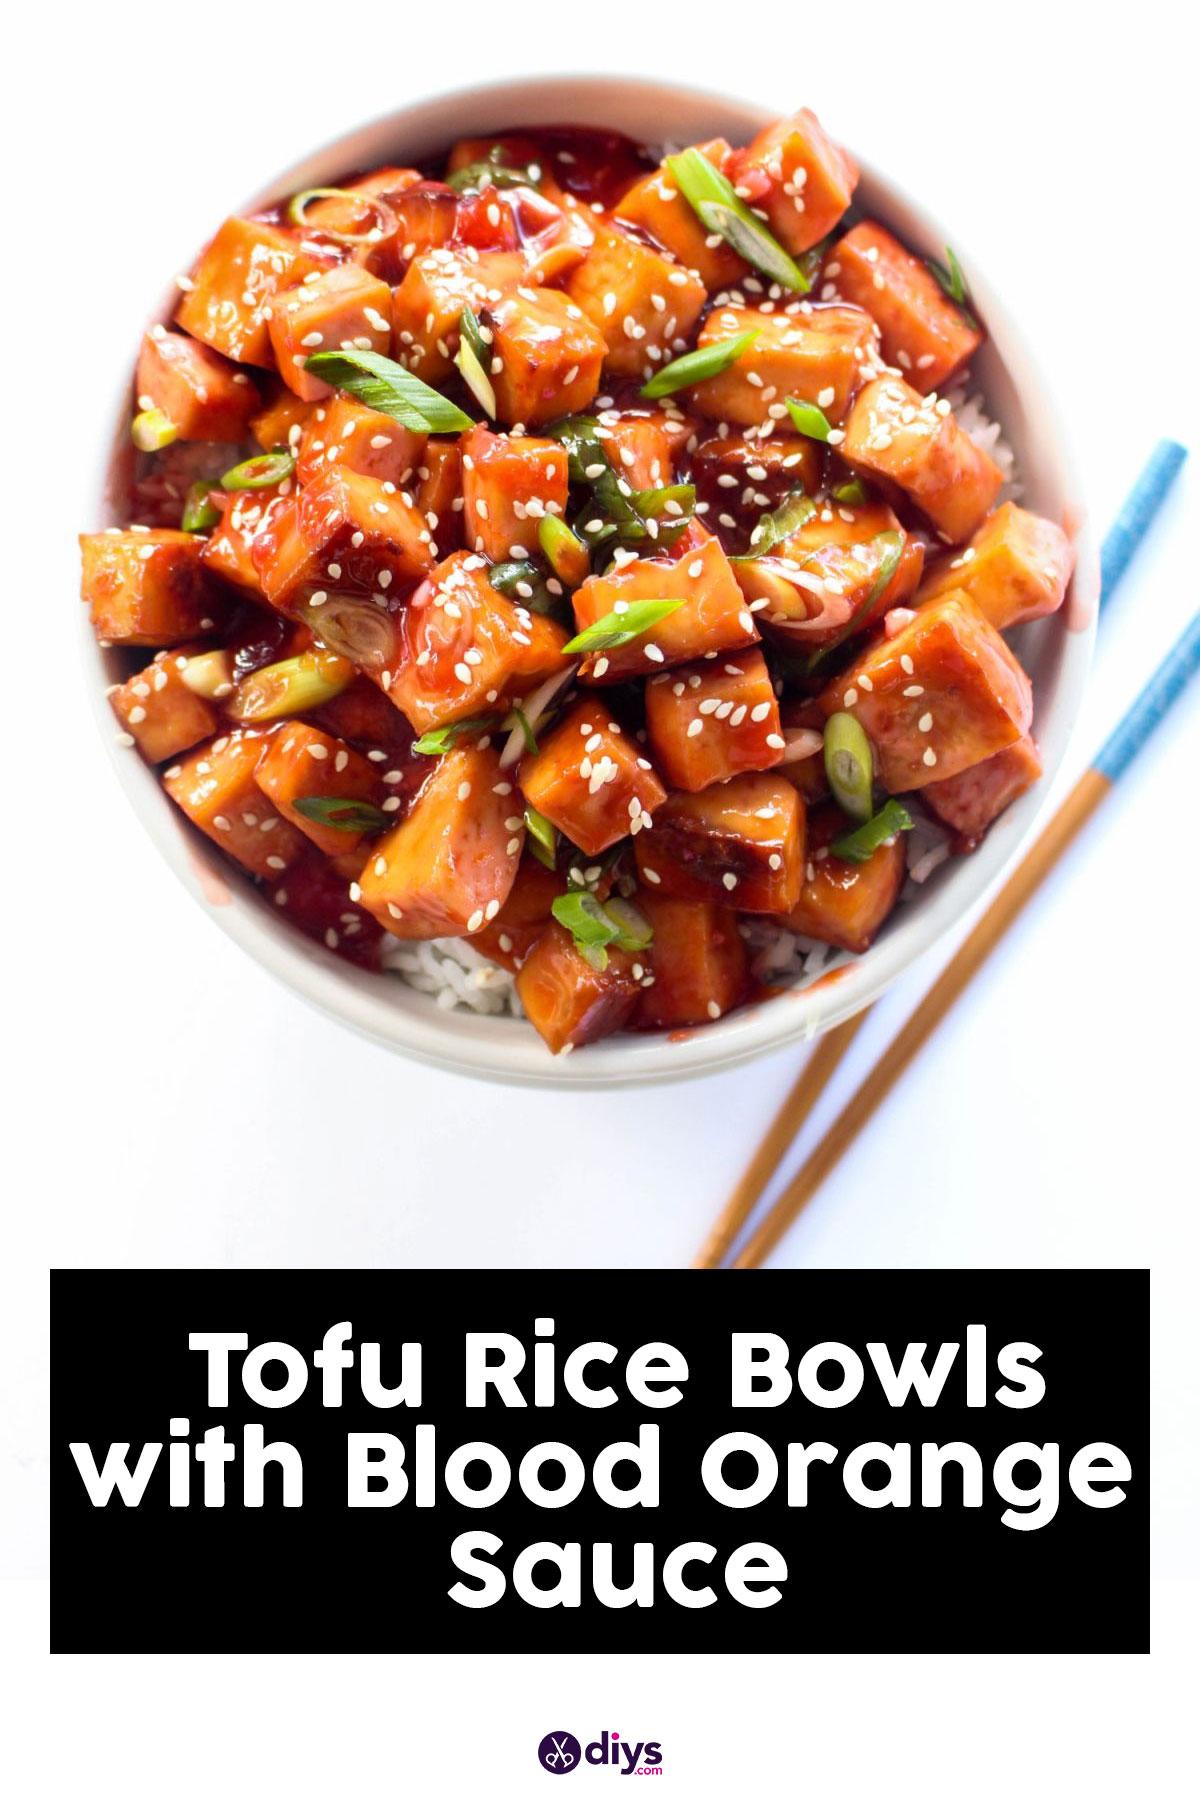 Tofu rice bowls